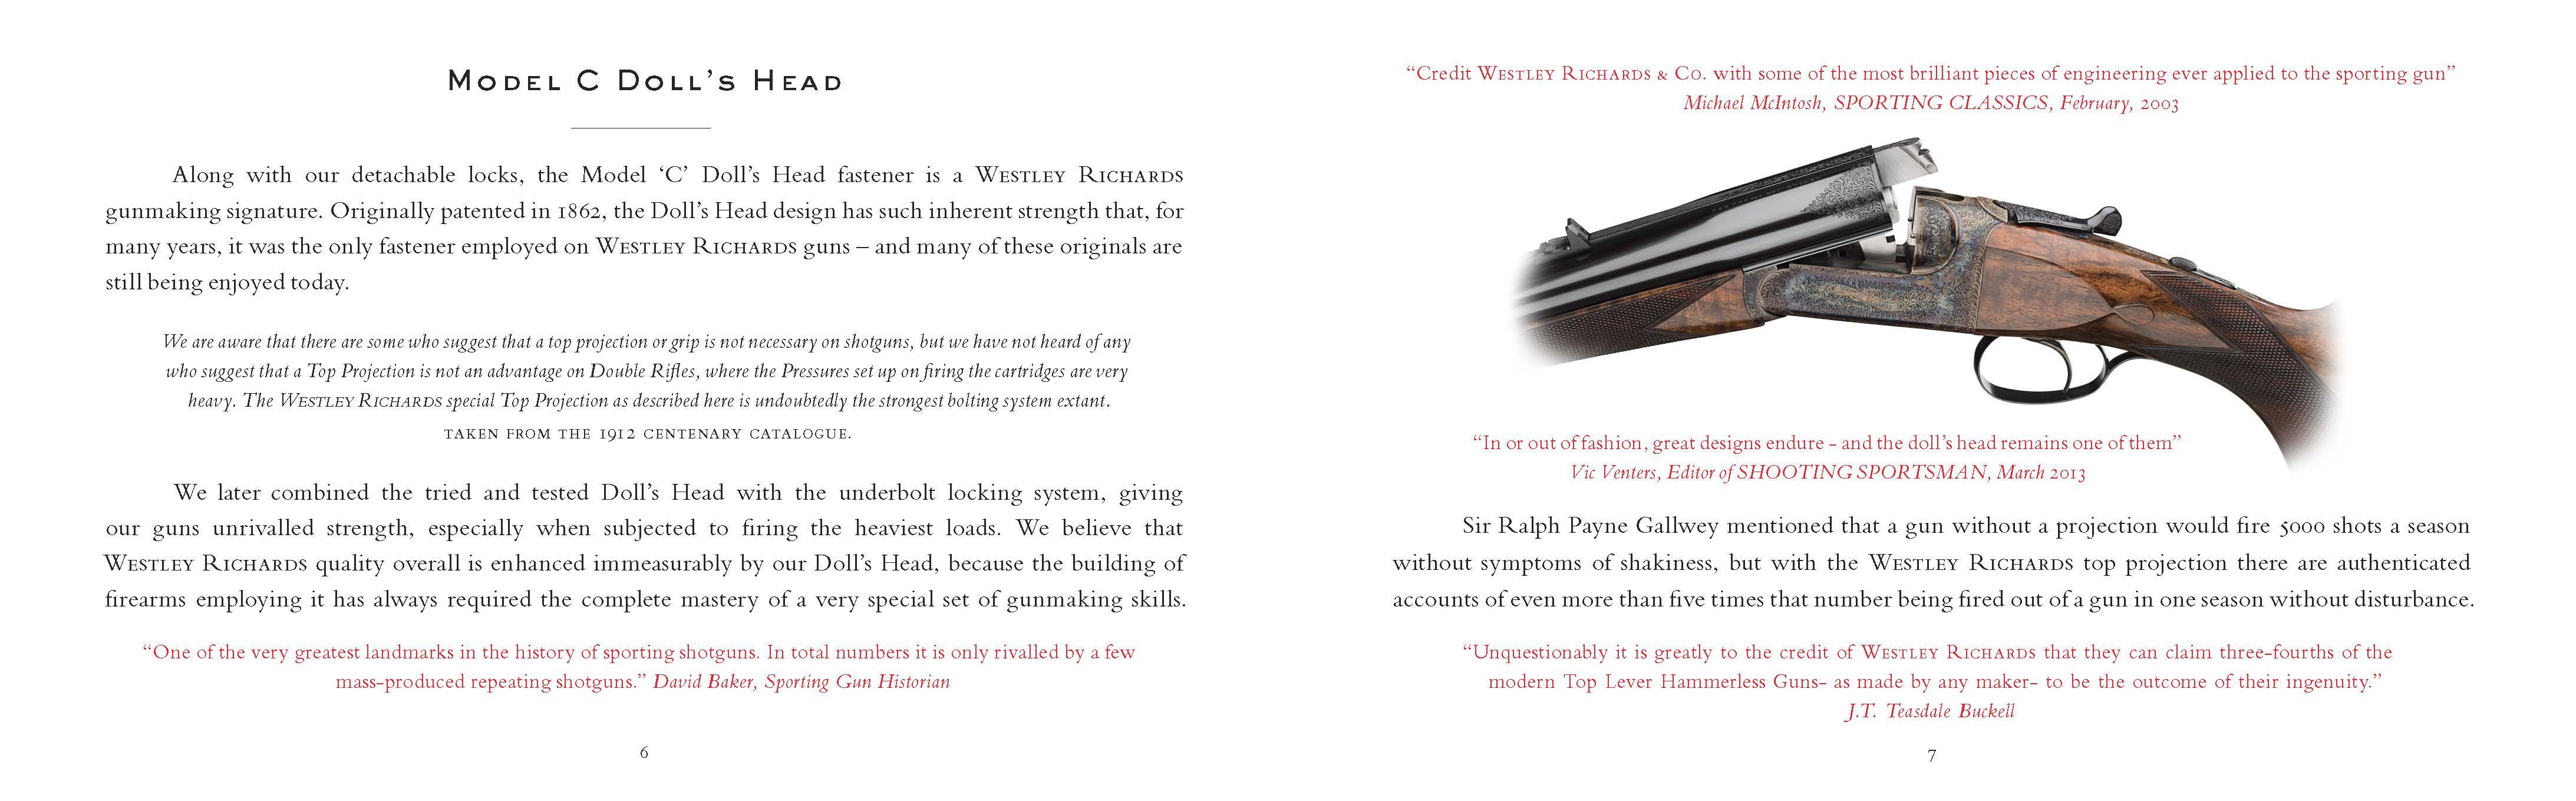 WR_Brochure_Part4